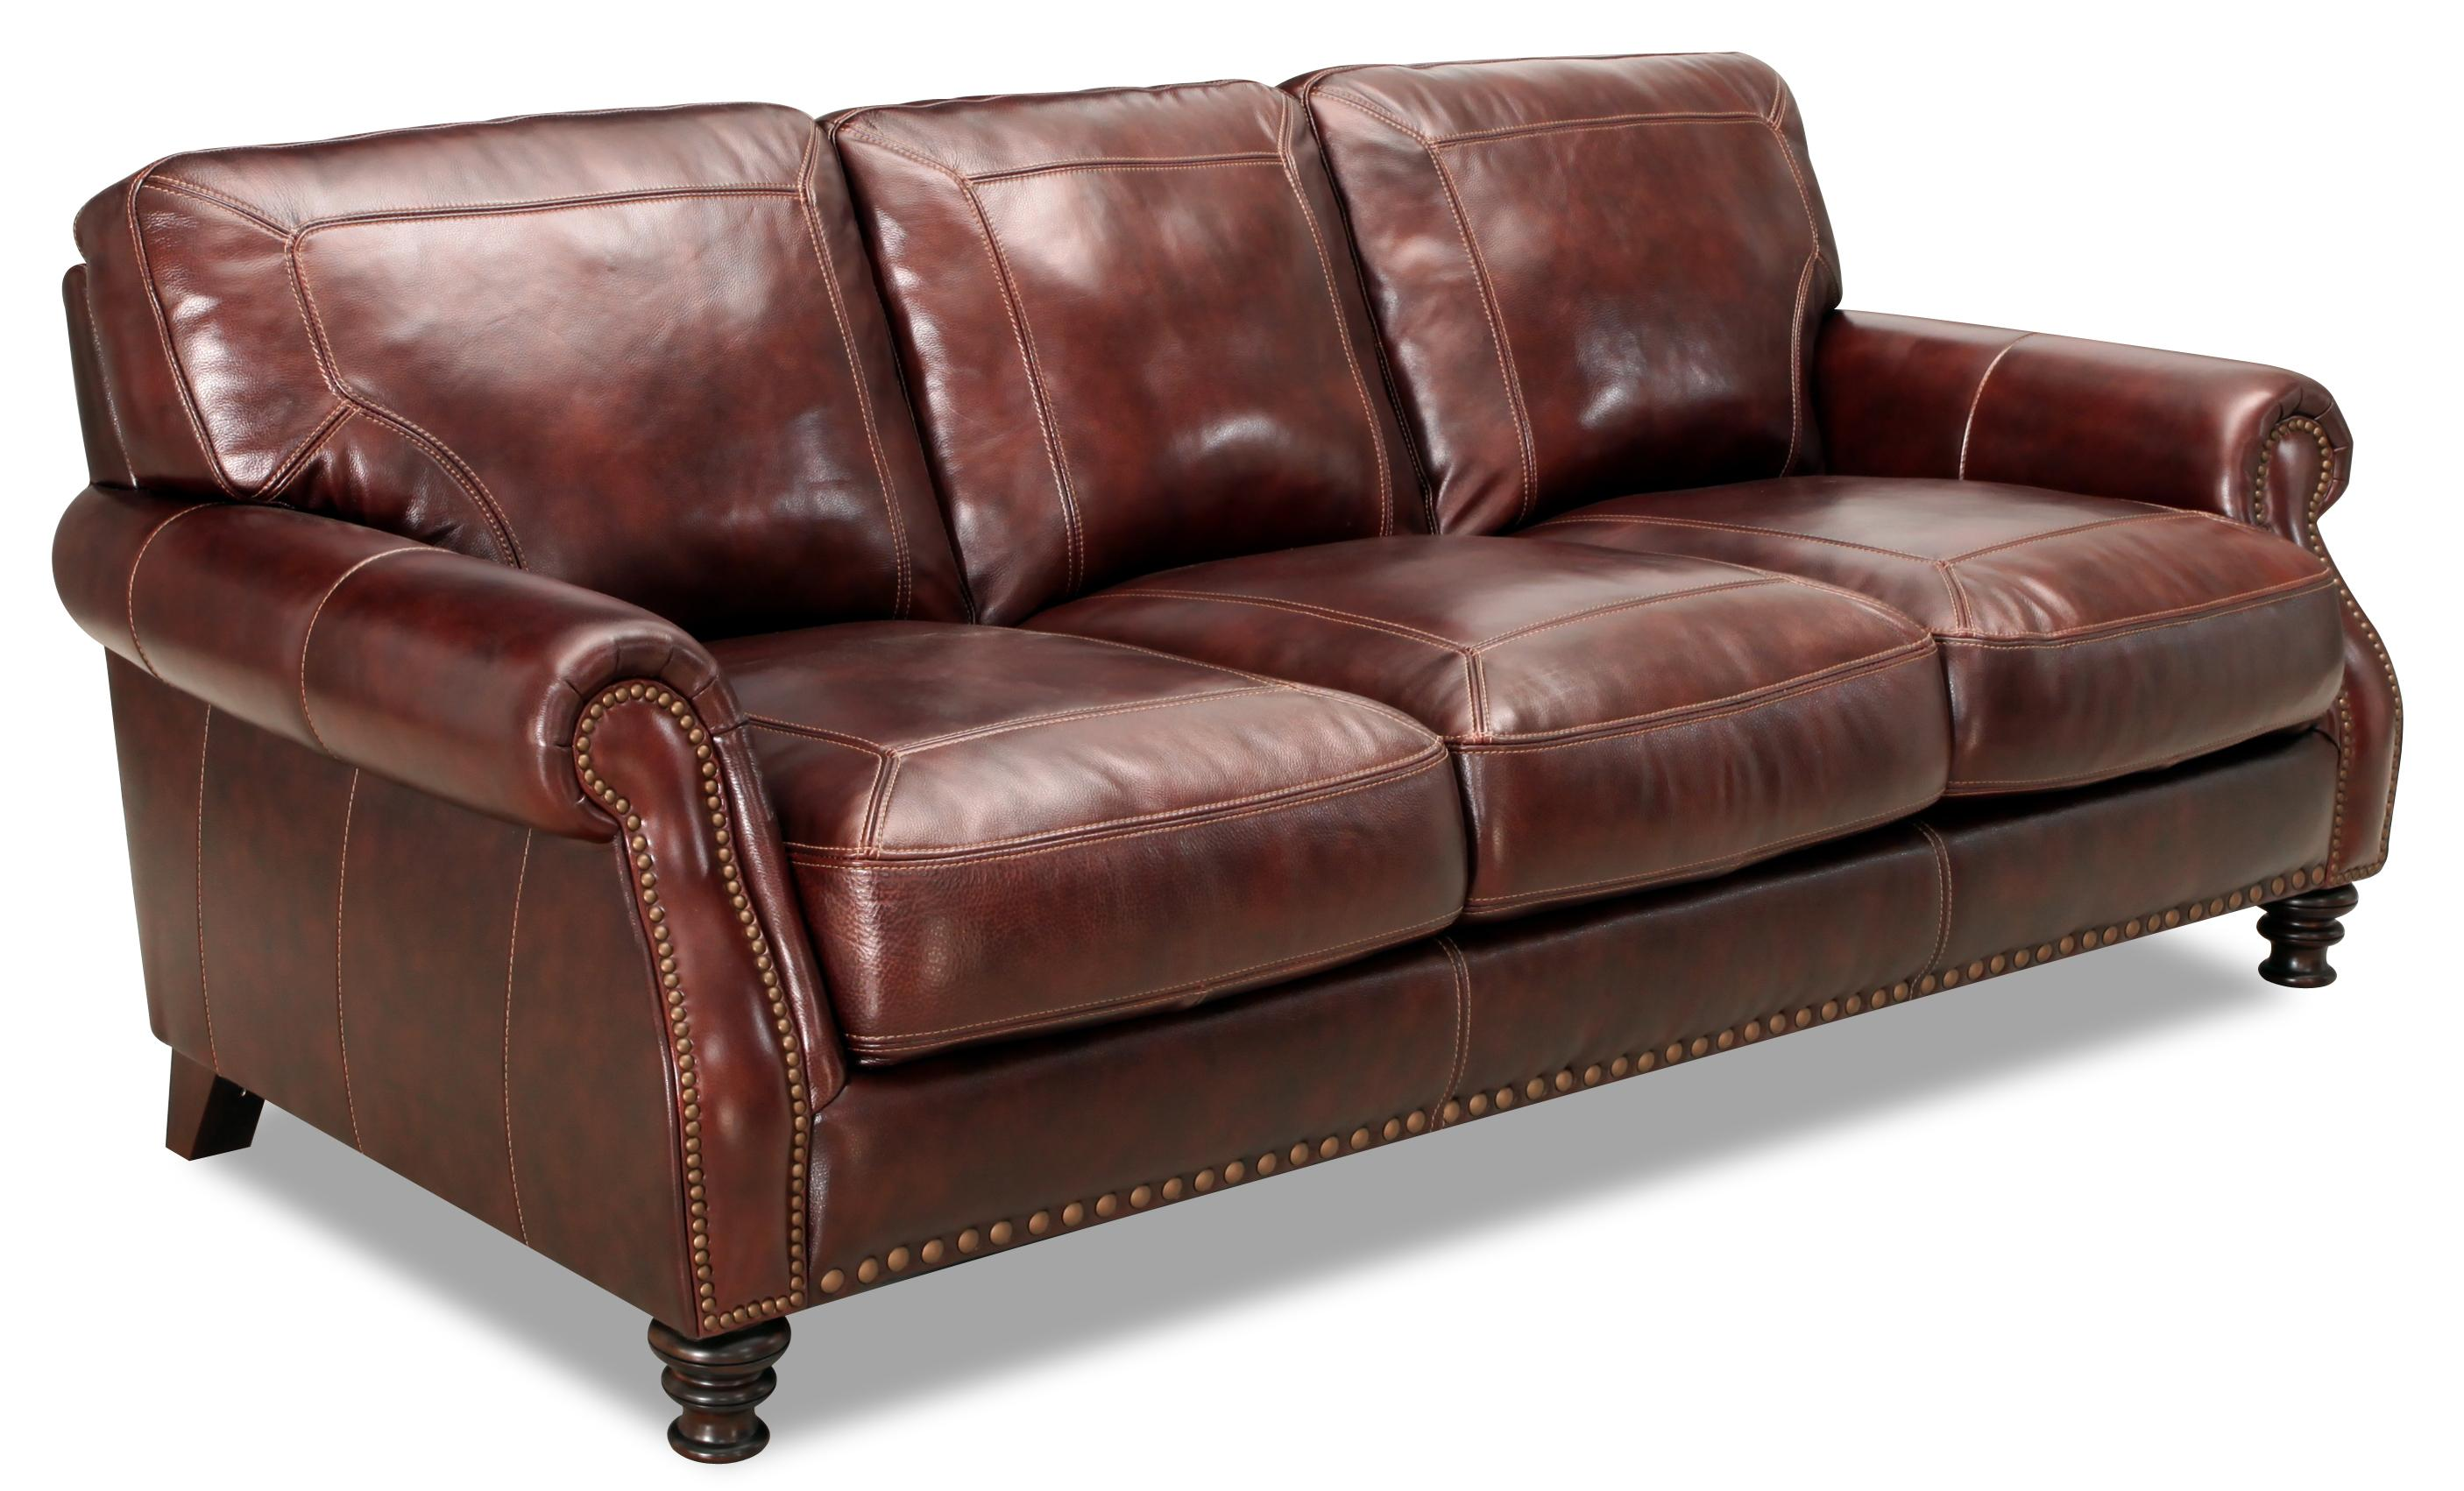 Simon Li 6978 Rolled Arm Sofa   Item Number: 6978 30